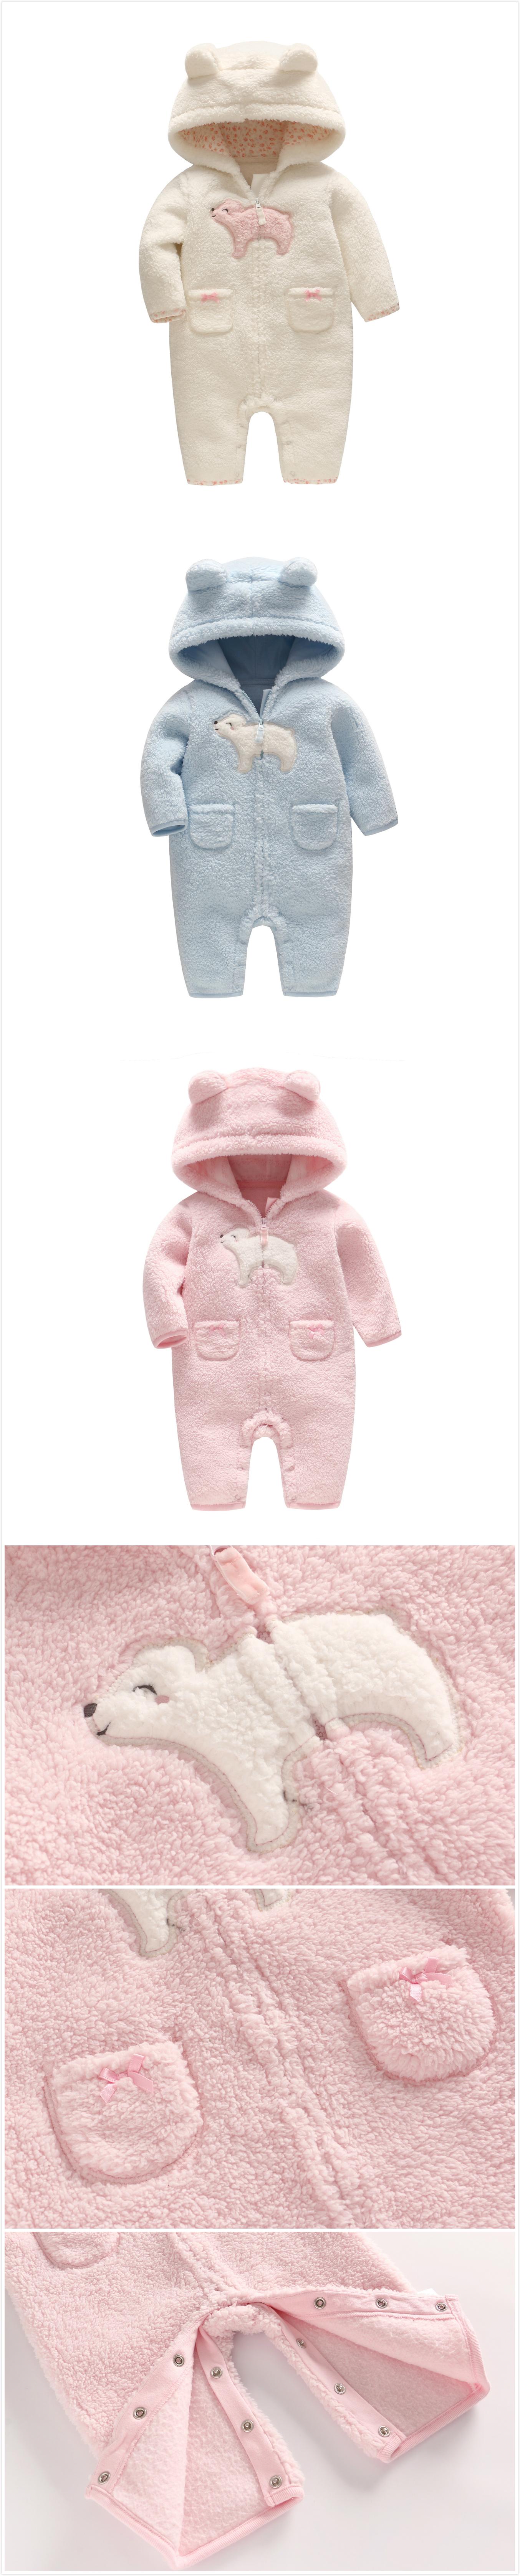 57faae096 Cartoon Polar Bear Cashmere Baby Winter Warm Hooded Jumpsuit 3 ...